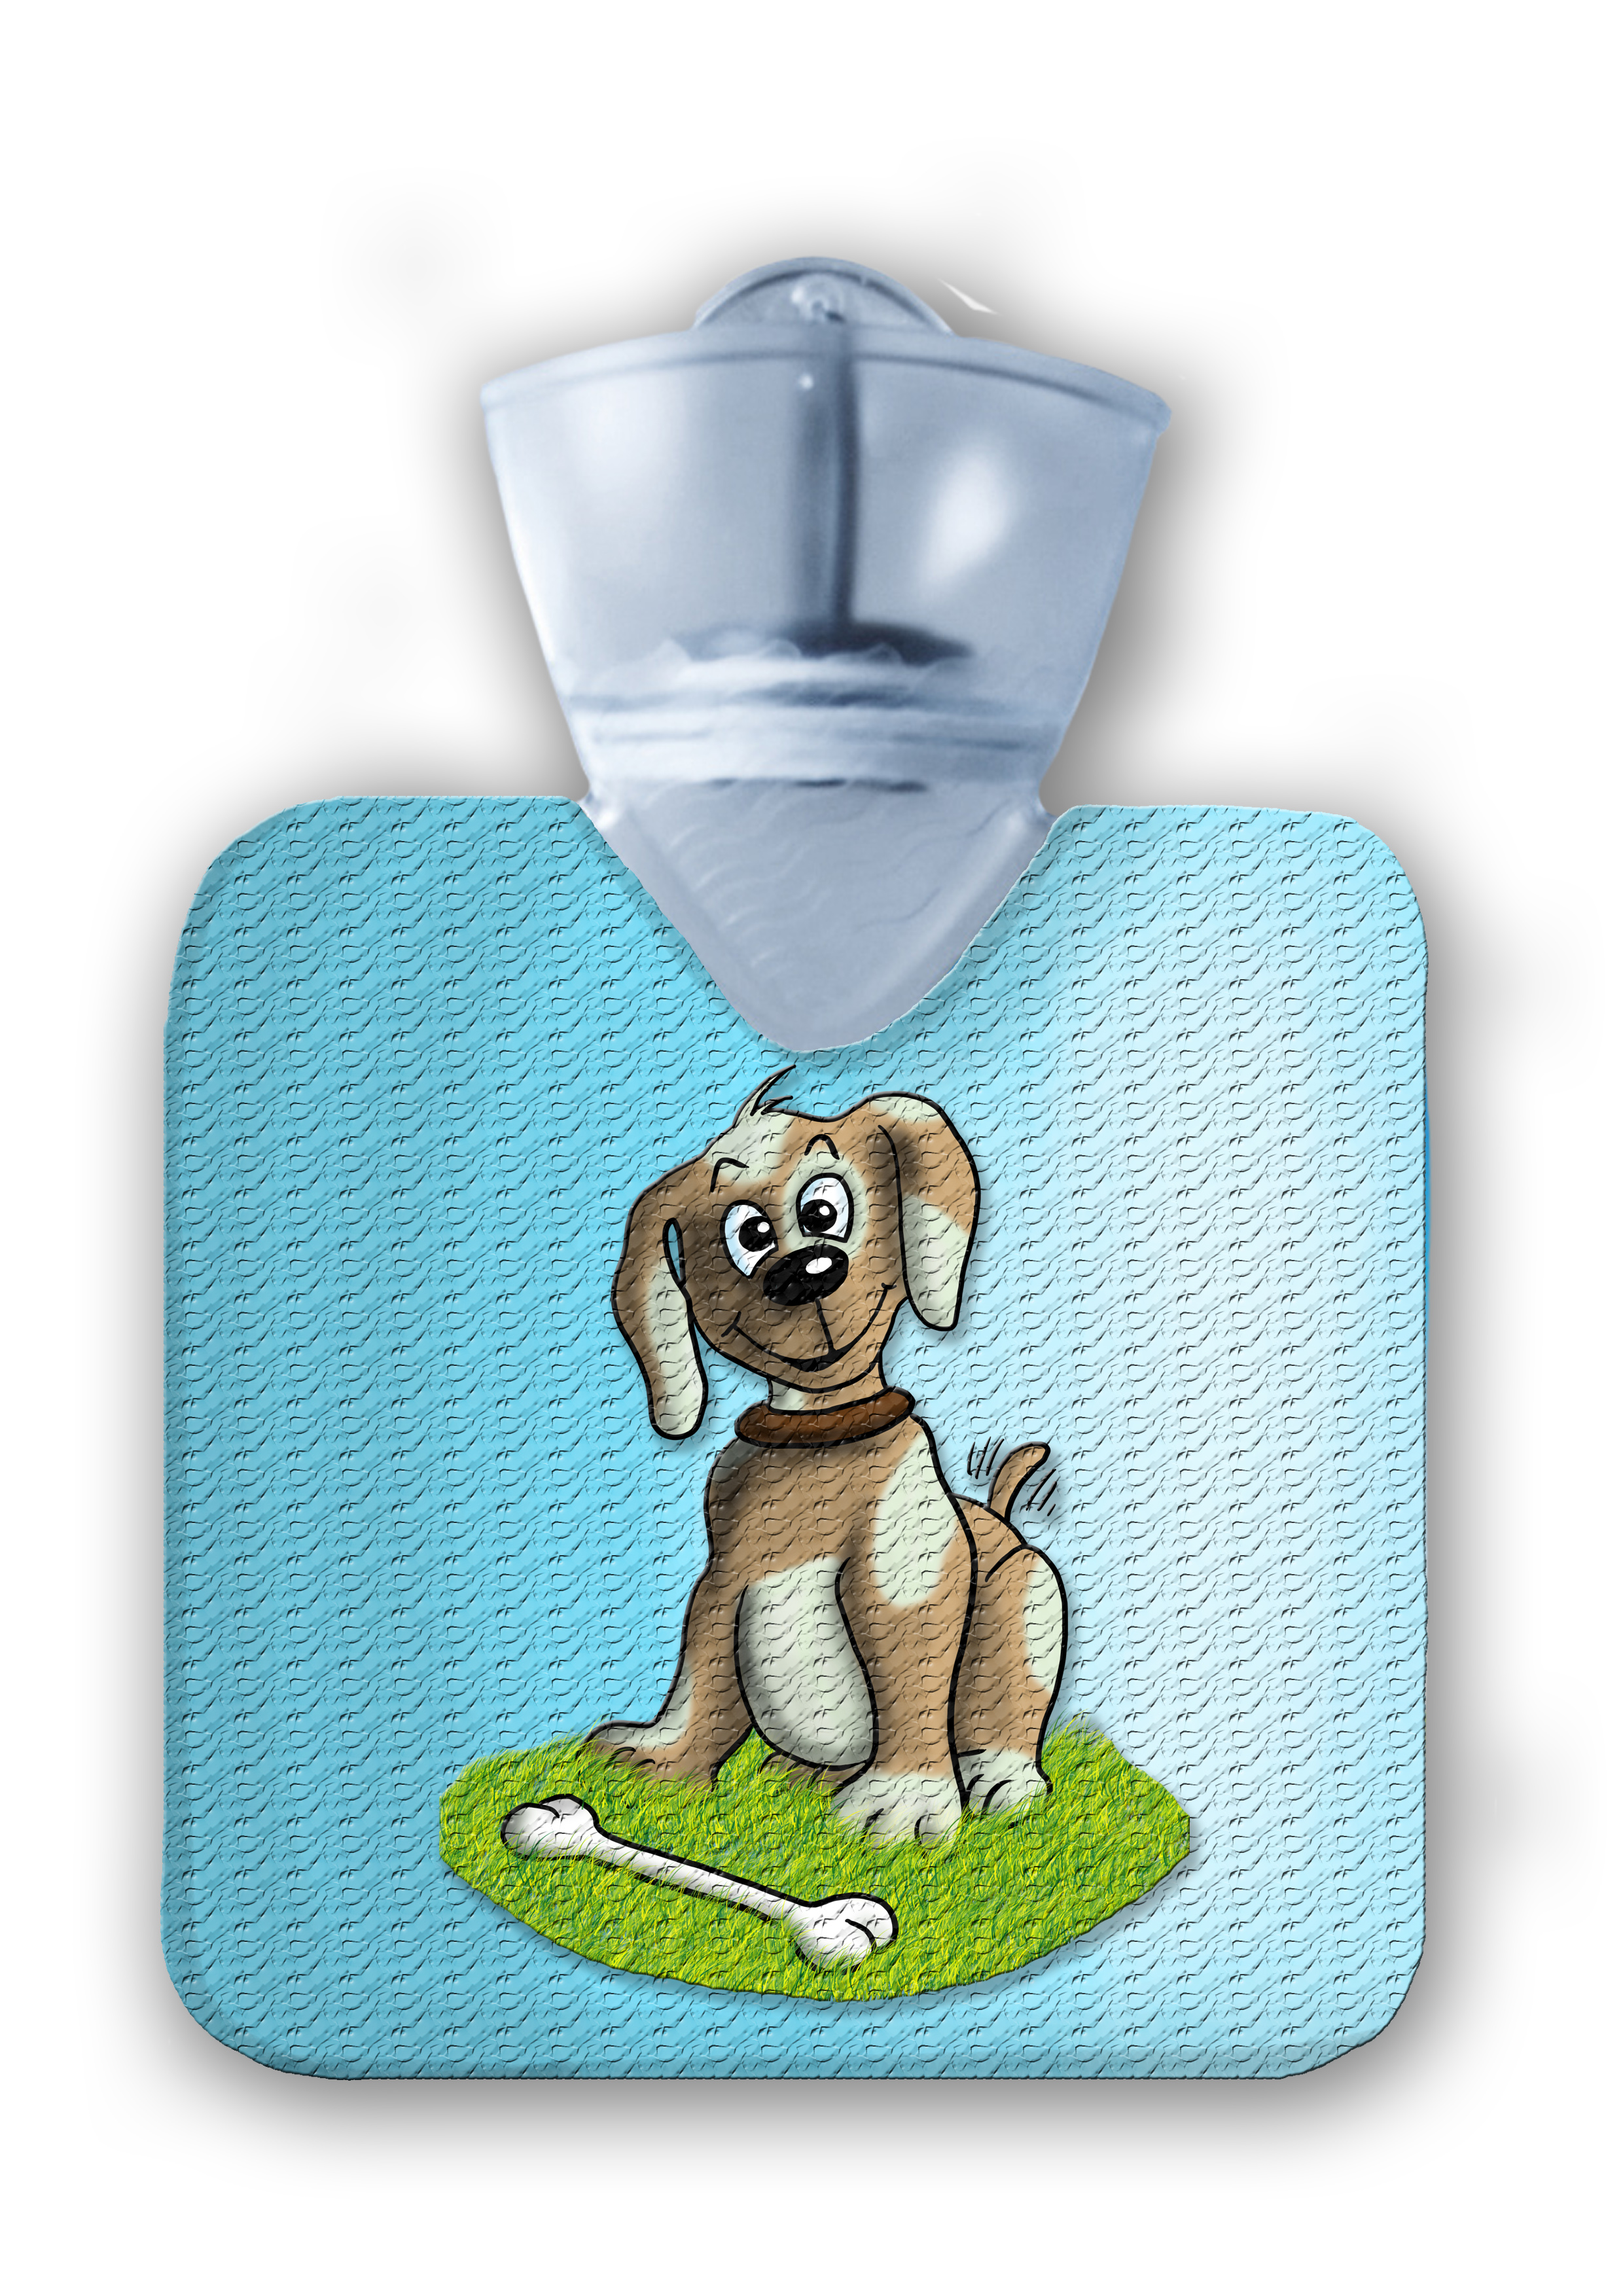 kinderflasche frei hellblau Hund struktur abg